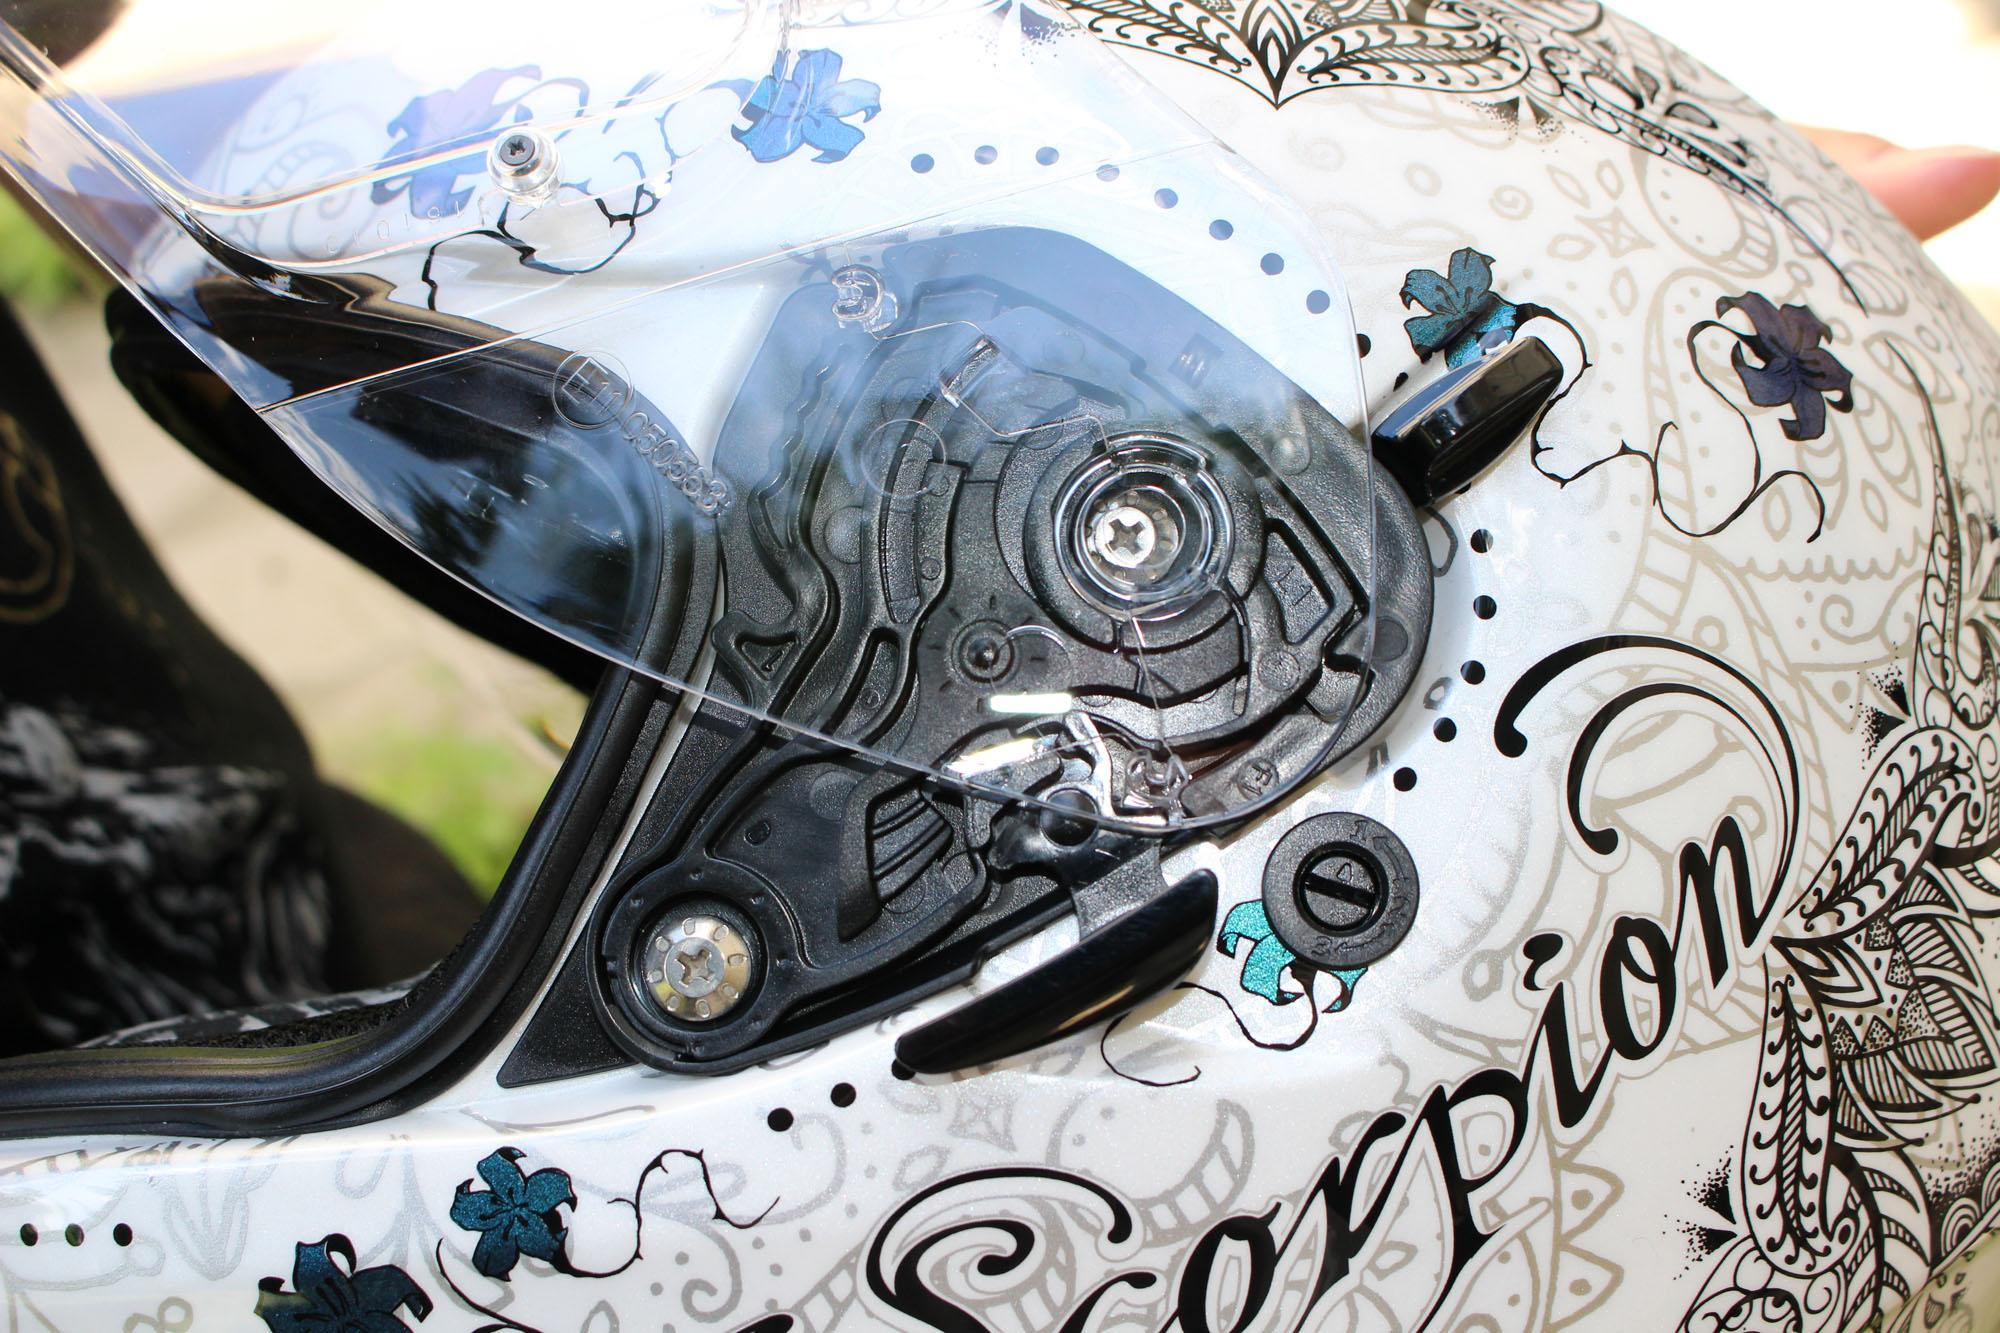 Dessins effets tattoo sur l'ensemble du casque Scorpion Exo 510 Air